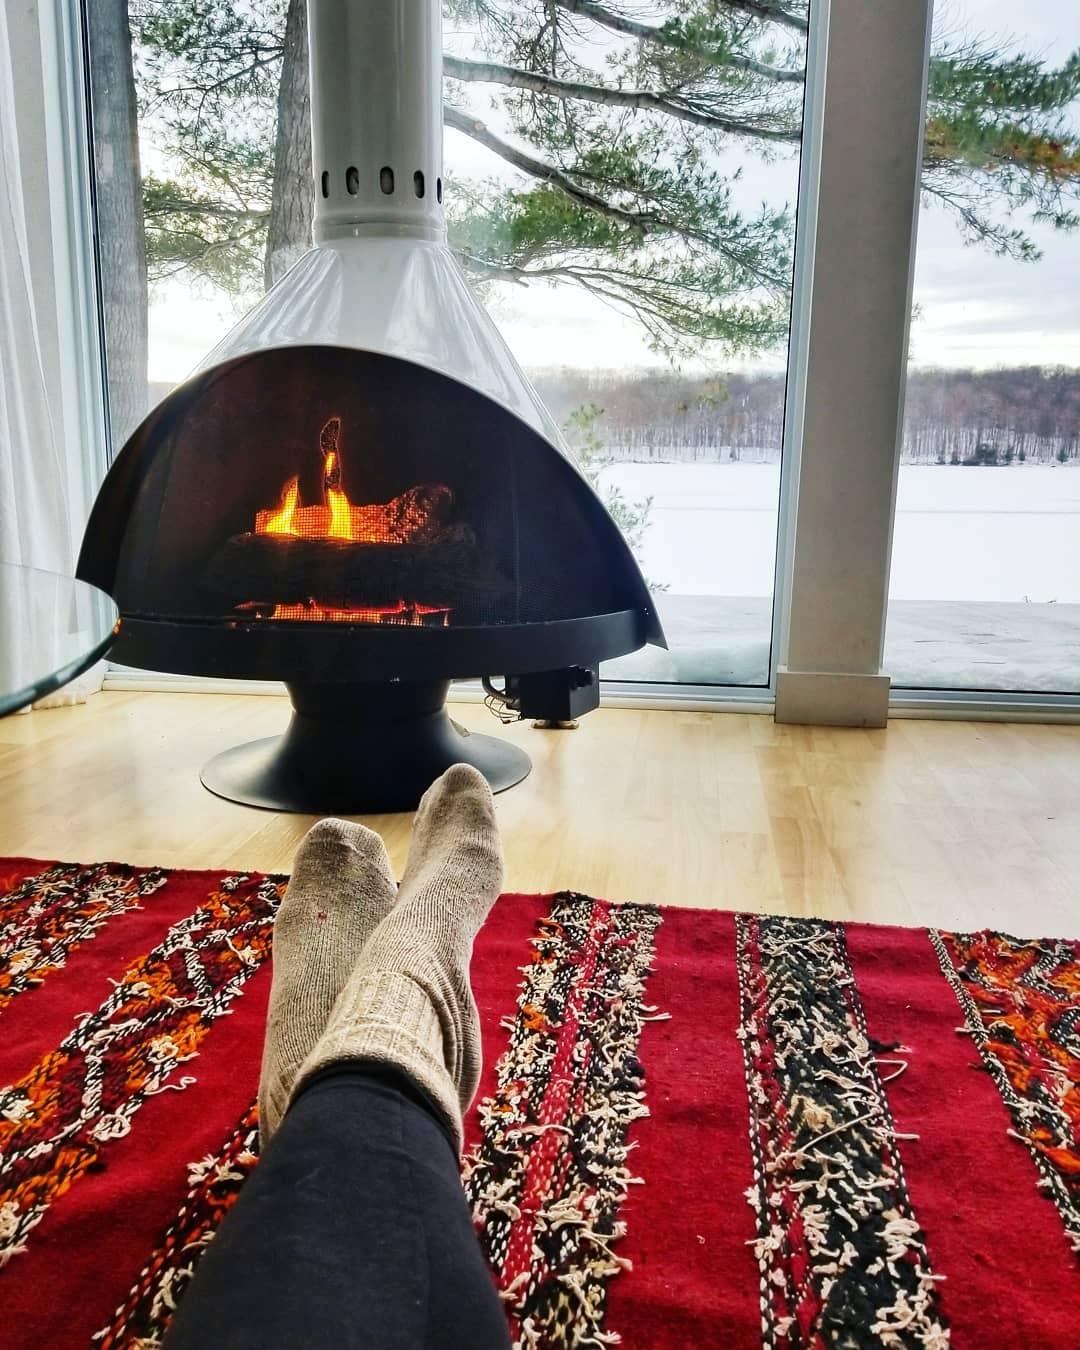 The Best Websites to Book a Homey Getaway